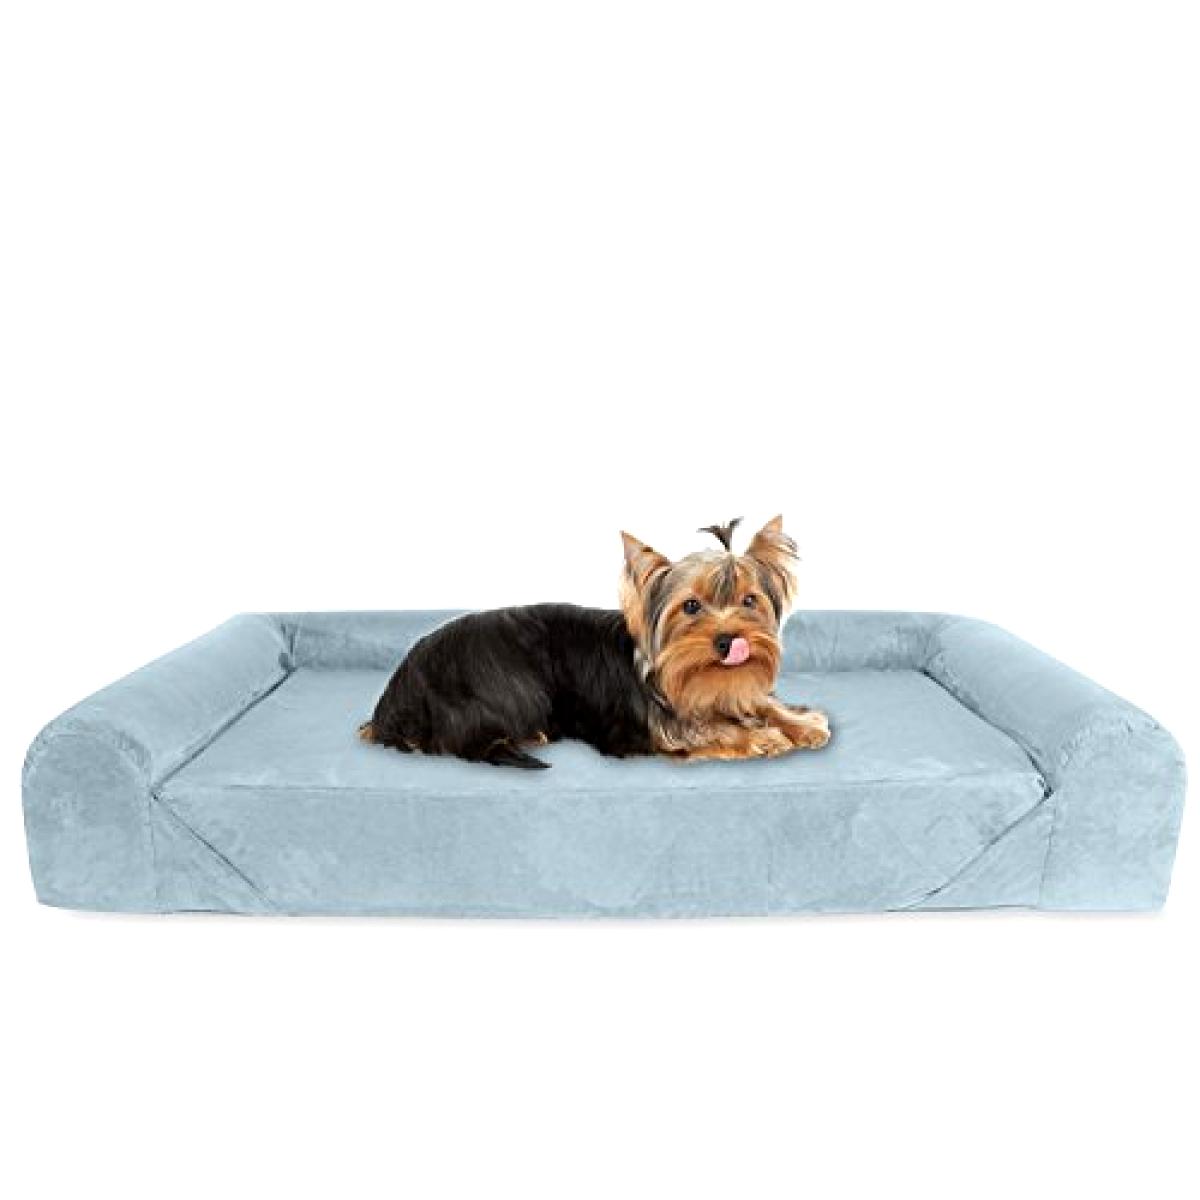 Brand New KOPEKS Deluxe Orthopedic Memory Foam Sofa Lounge Dog Bed - Small, grigio